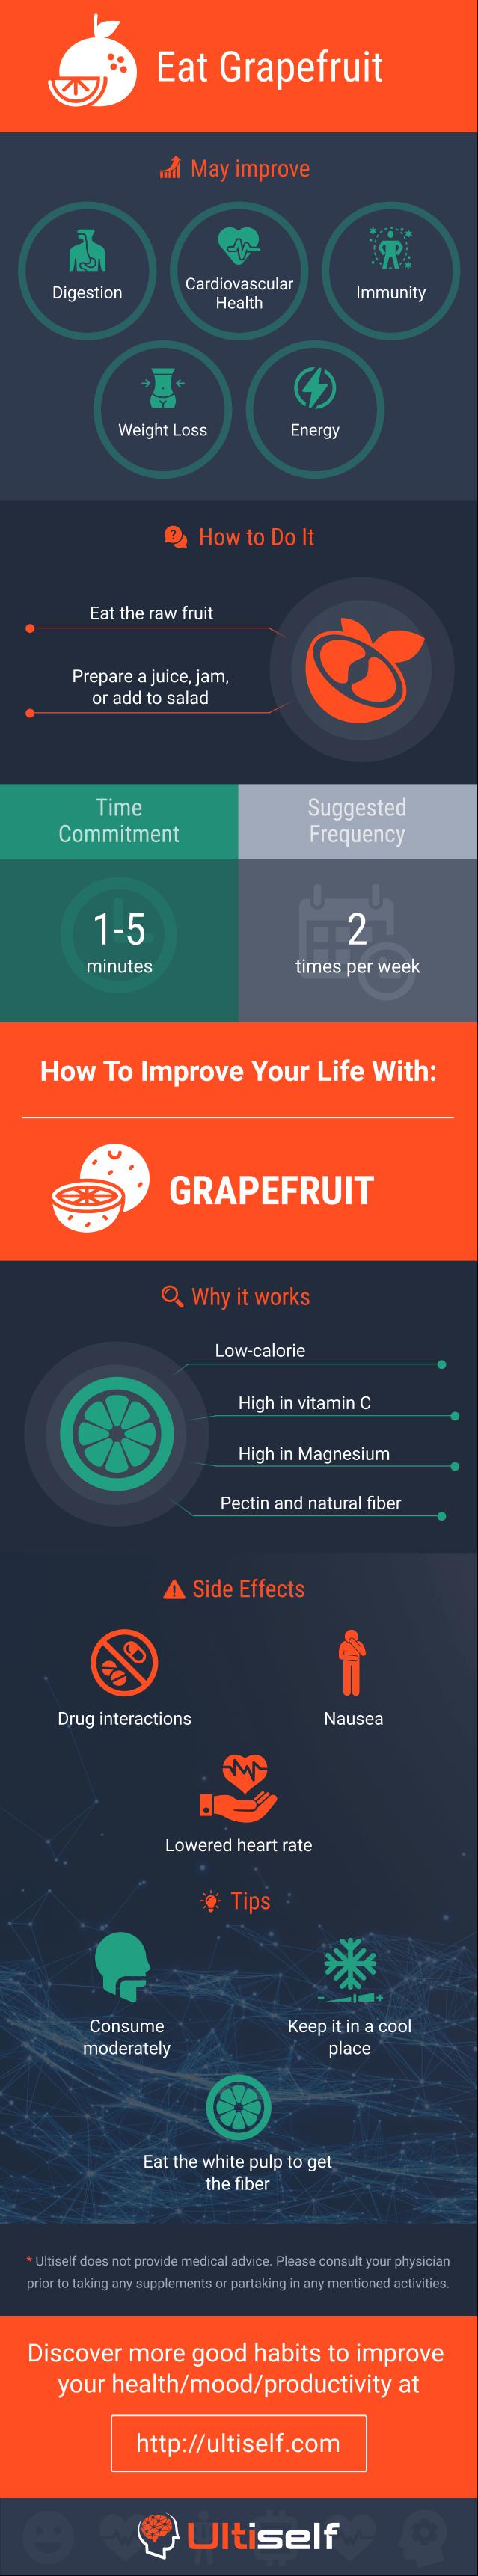 Eat Grapefruit infographic